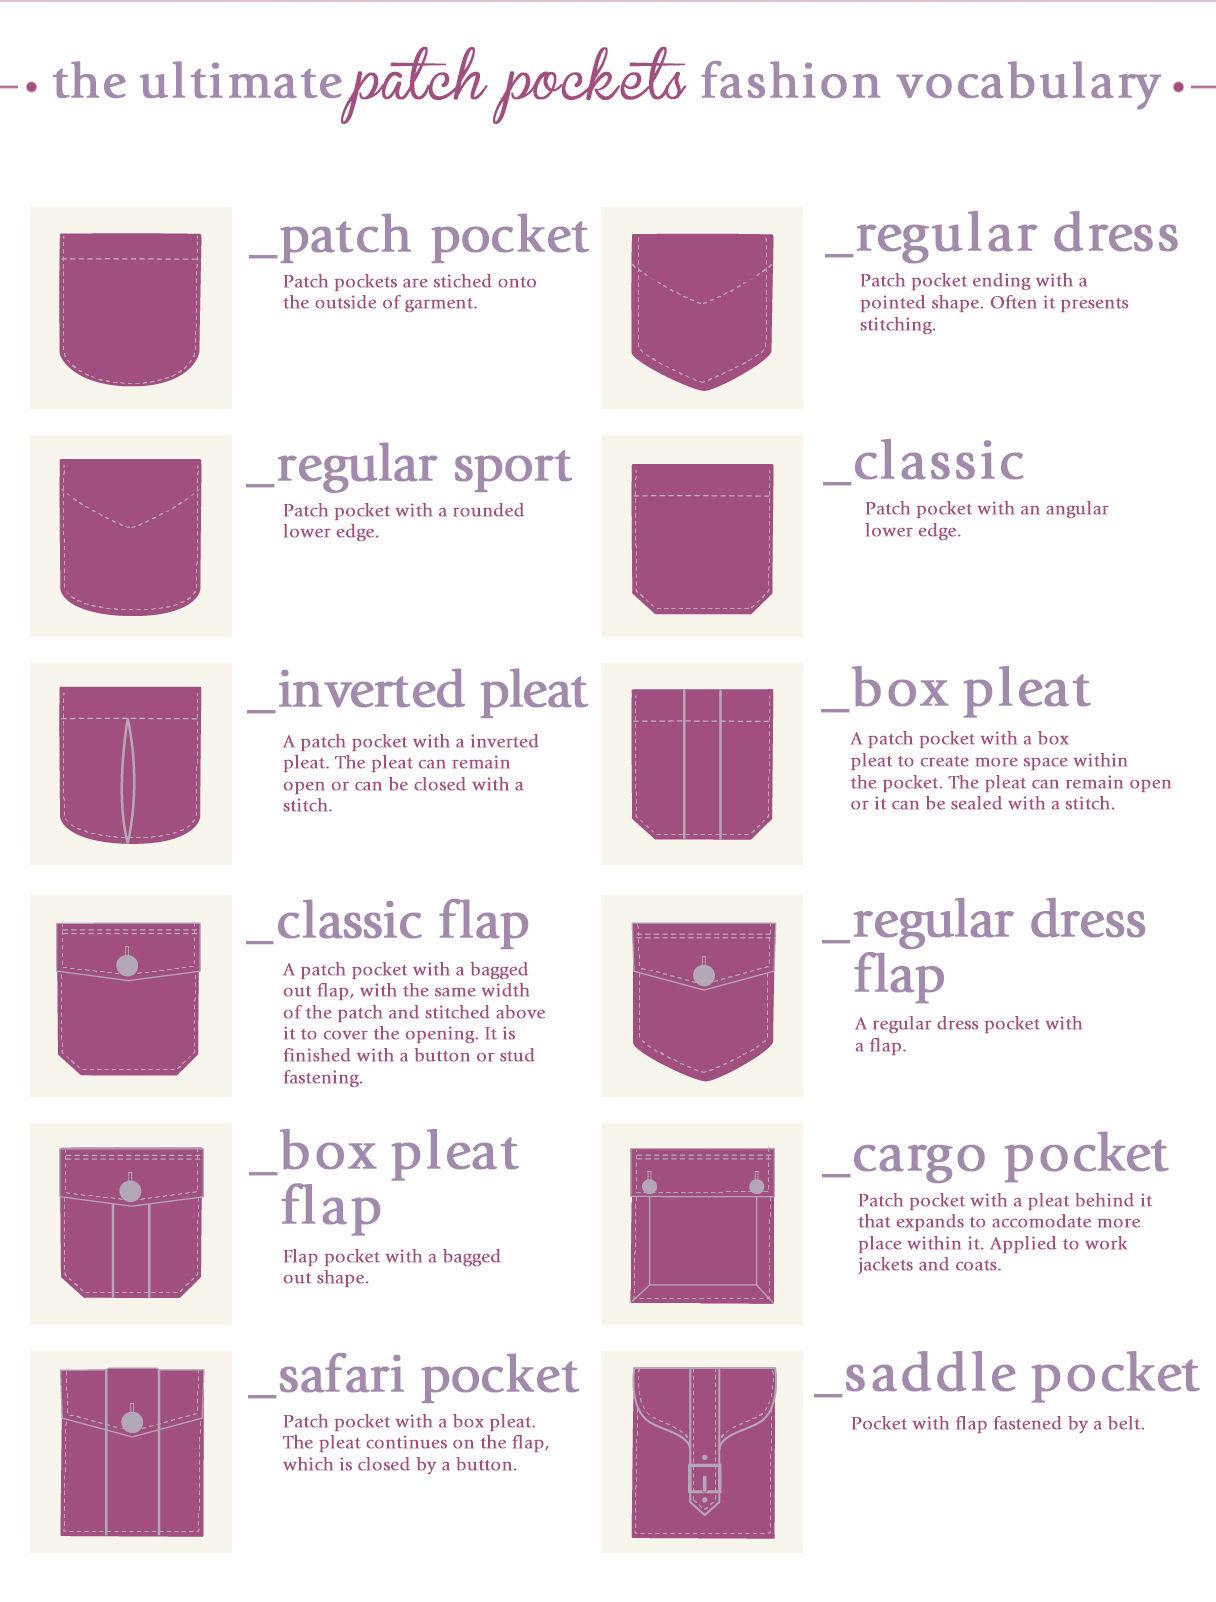 The ultimate patch pockets fashion vocabulary